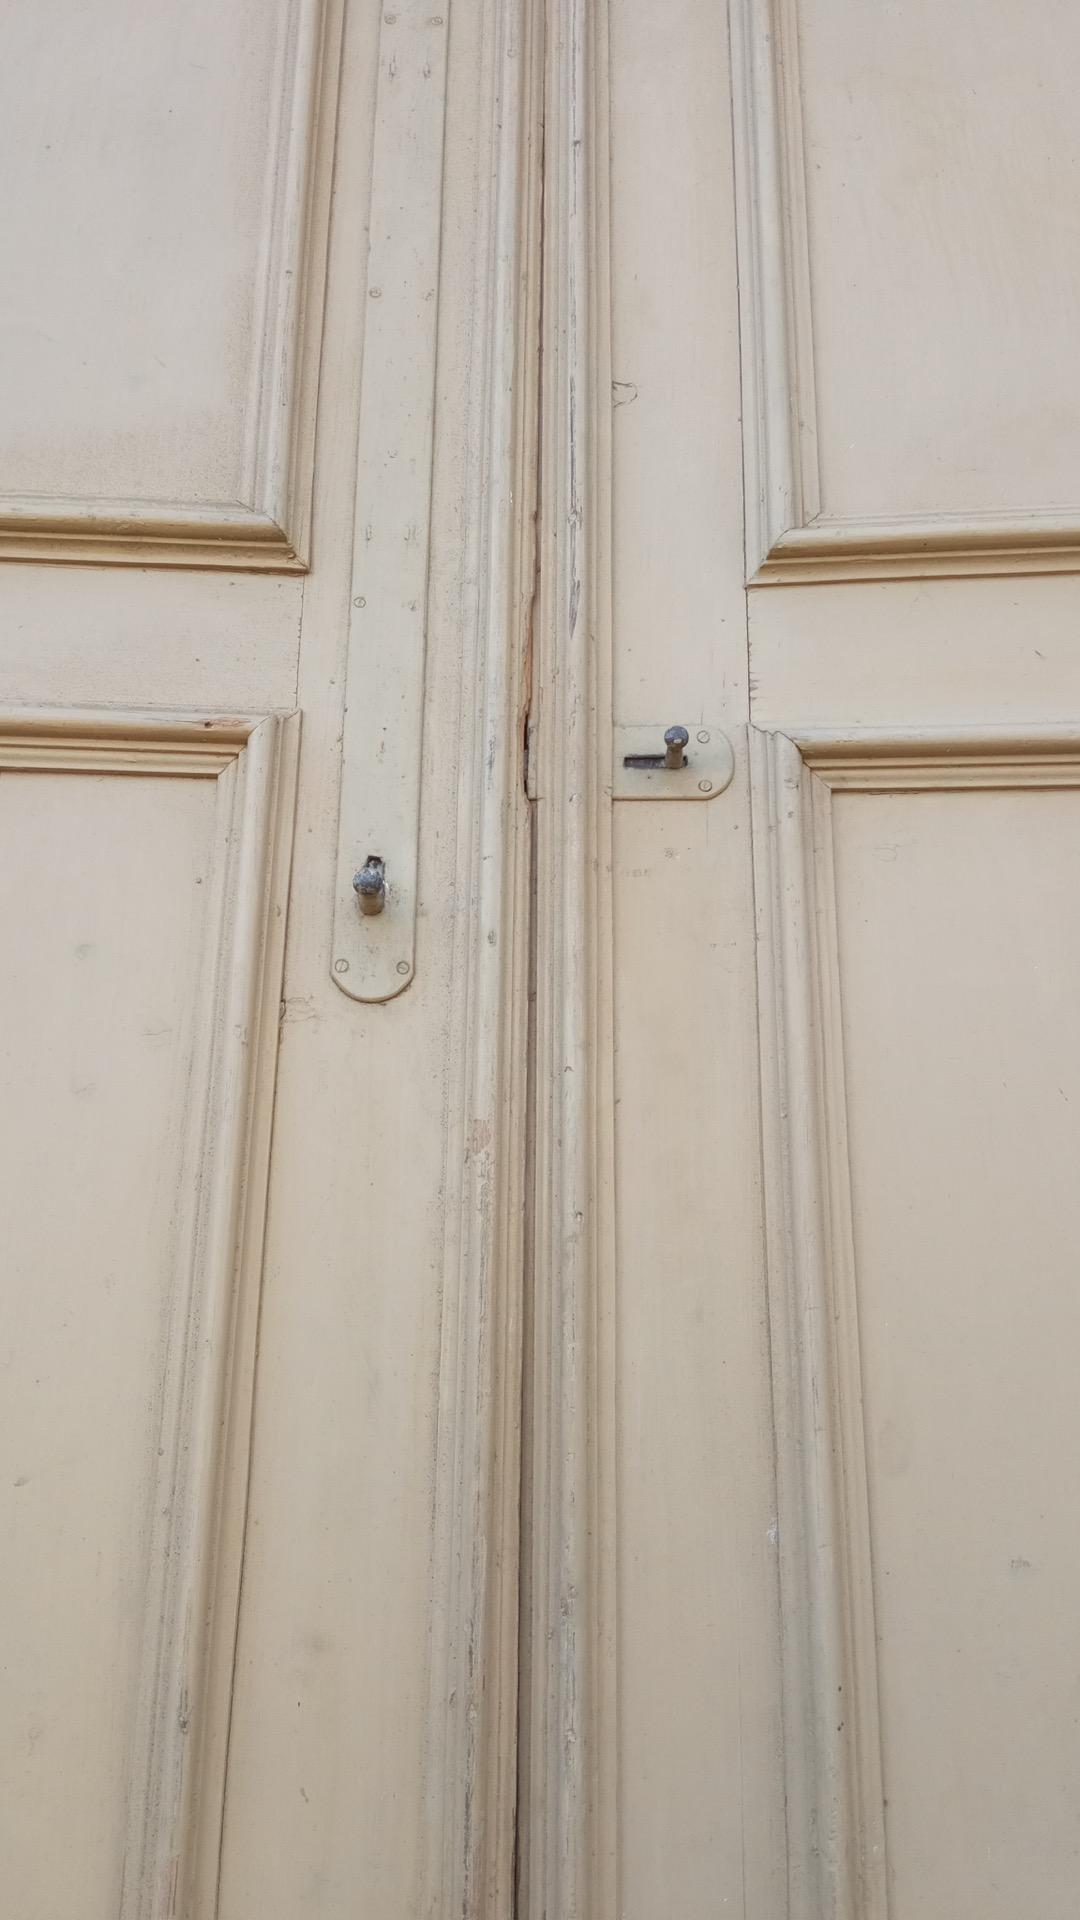 thumb2| 4 porte